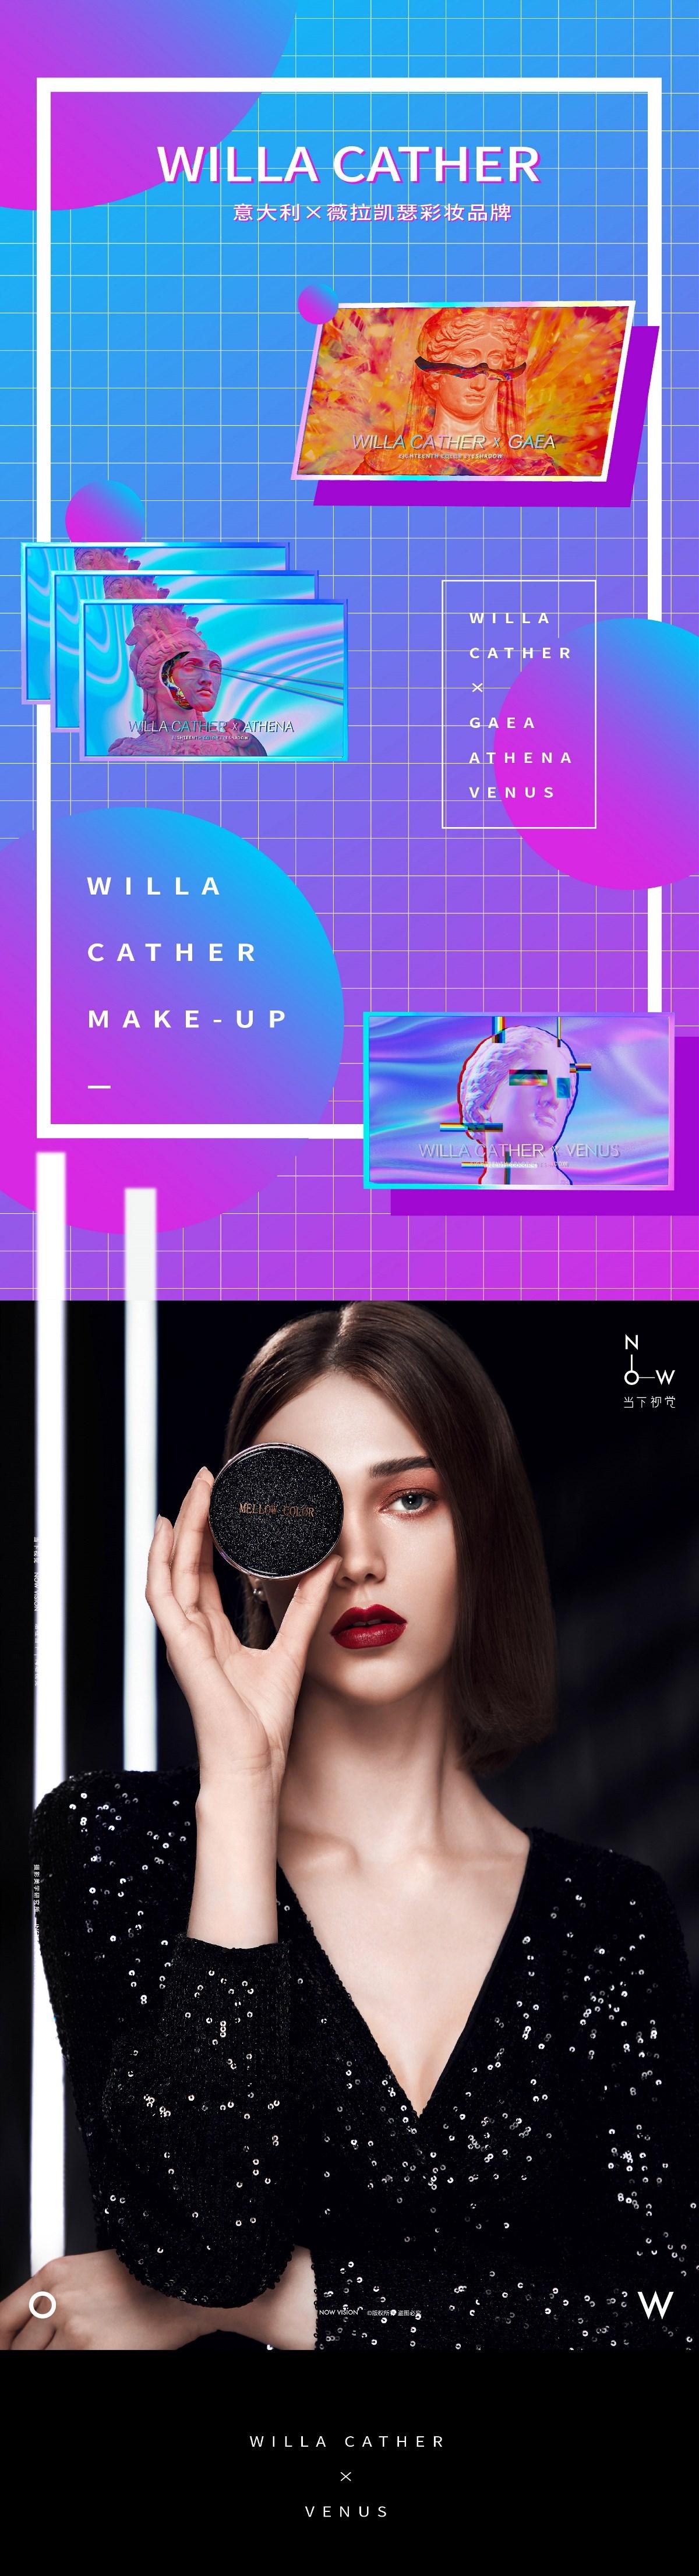 意大利彩妆品牌 X WILLA CATHER X 当下视觉NOW VISION